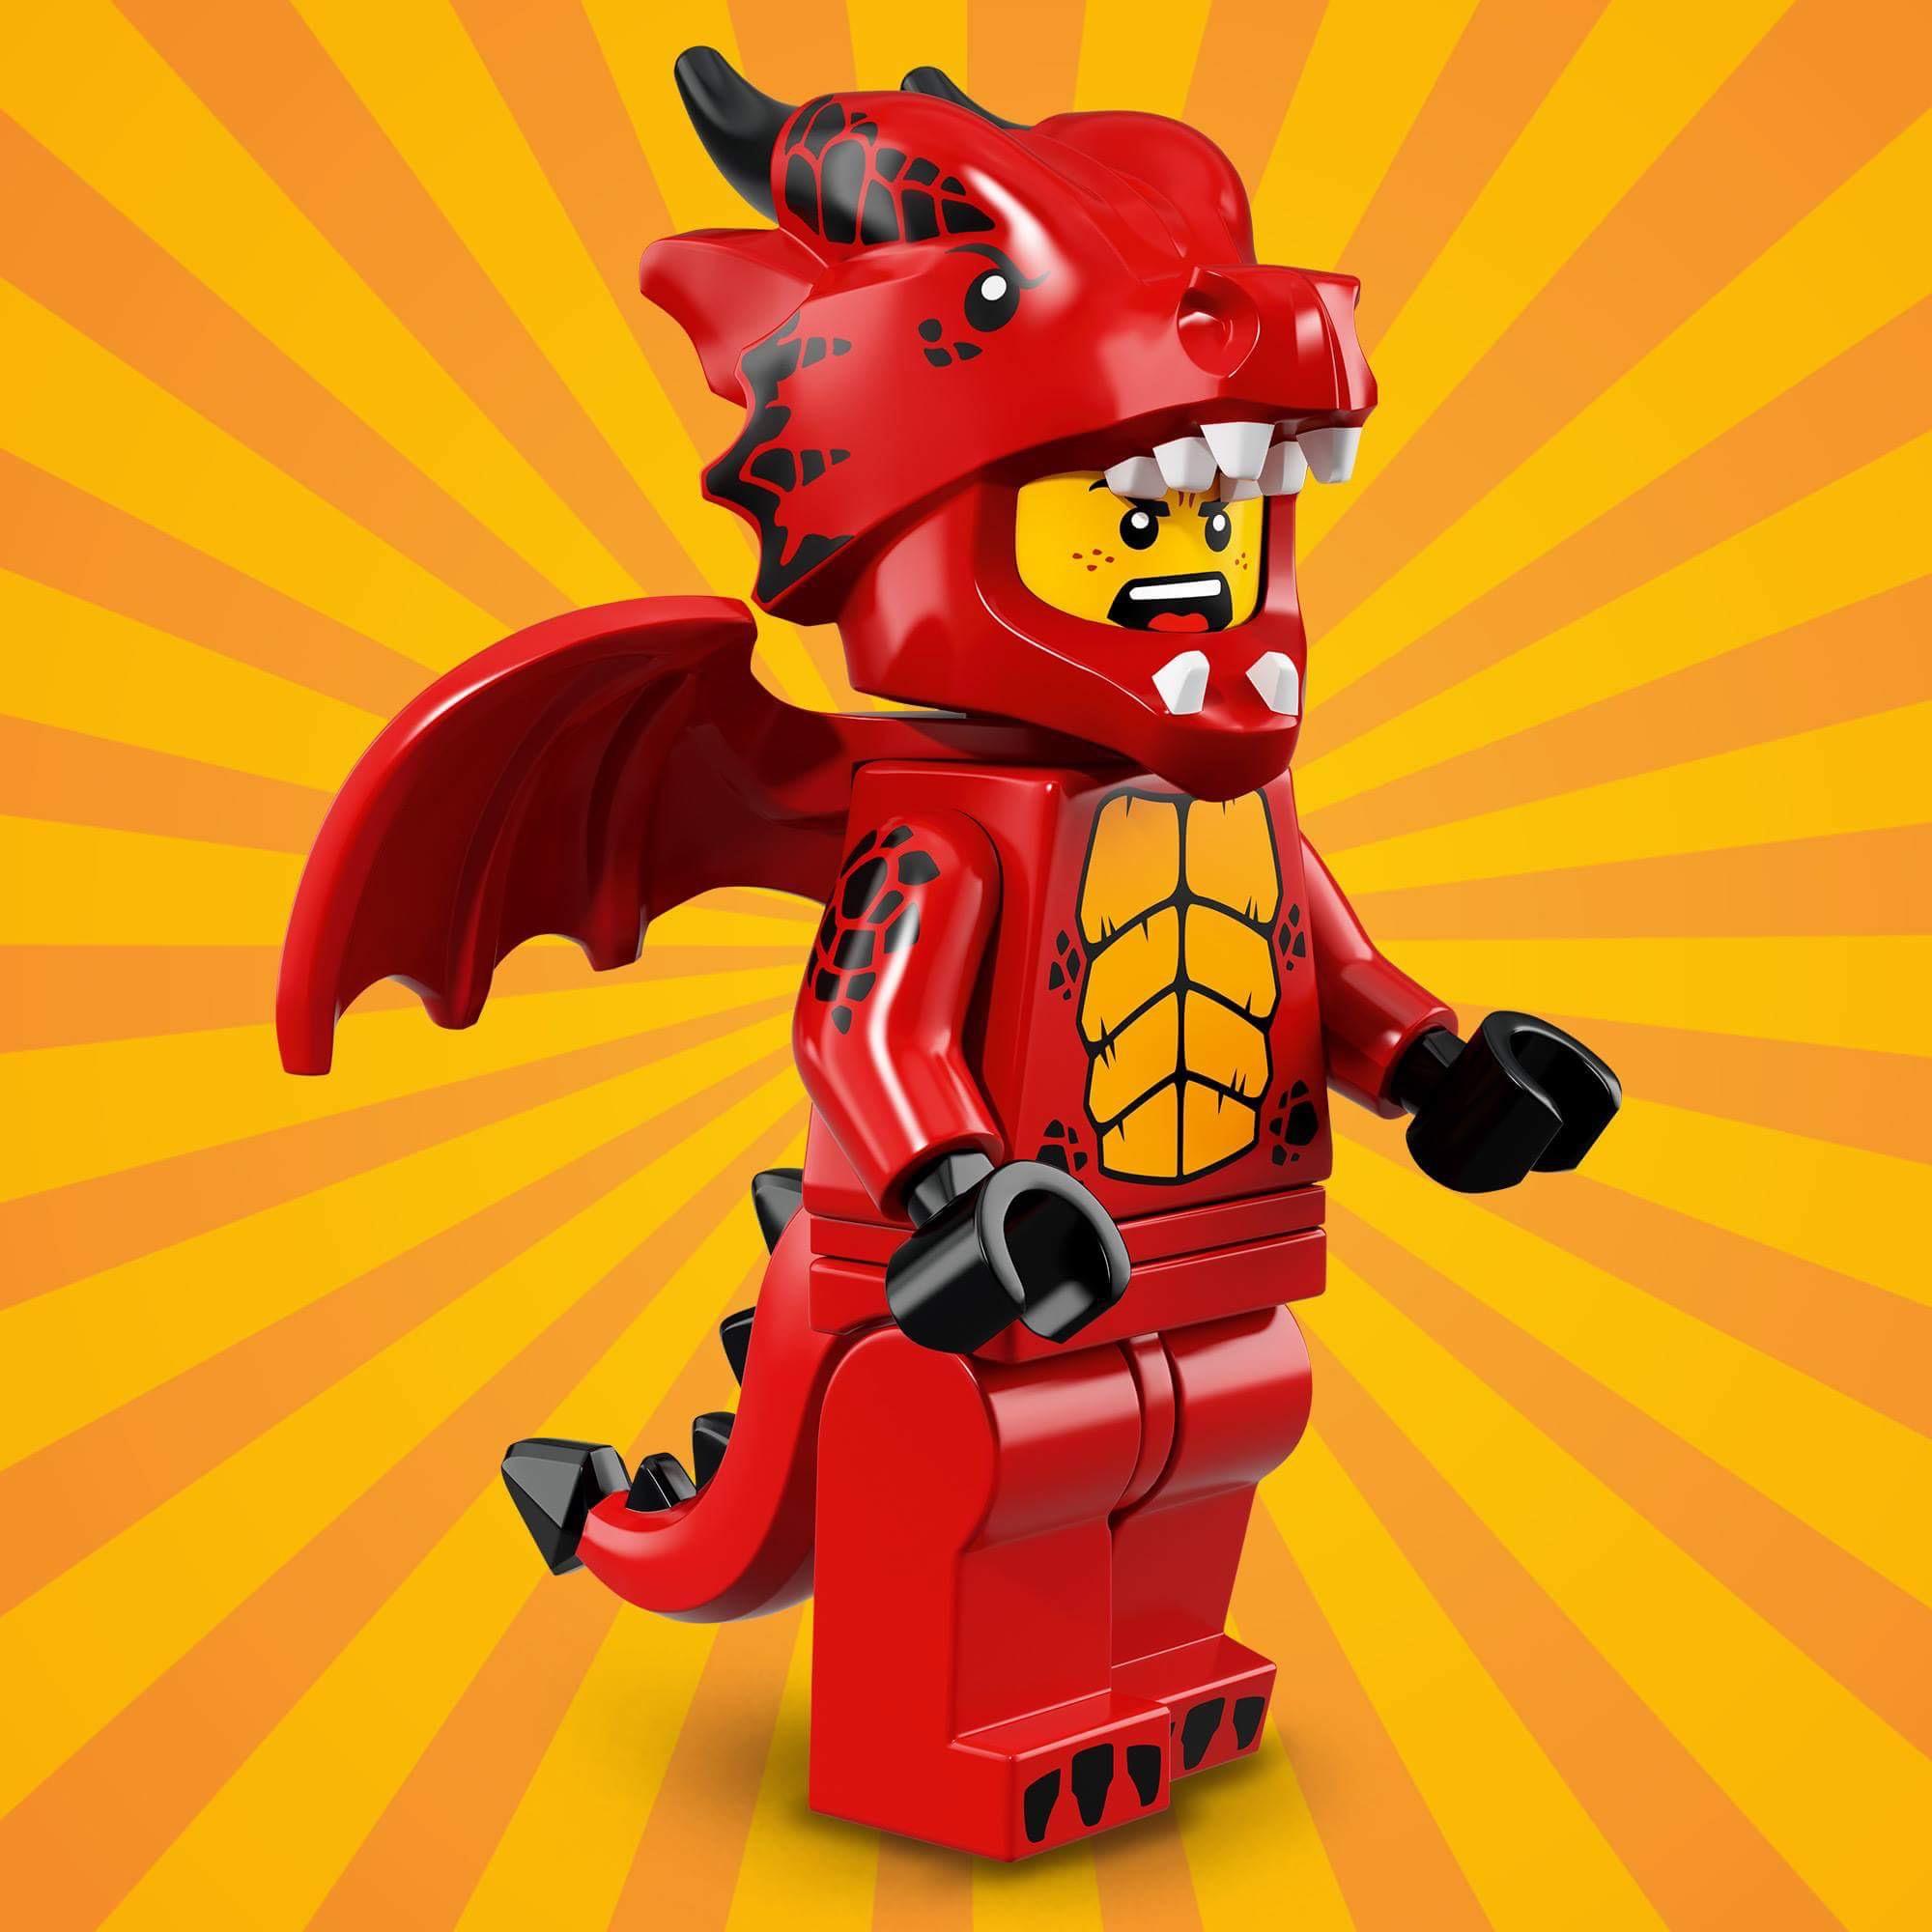 Race Car Suit Costume Guy NEW LEGO MINIFIGURES SERIES 18 71021